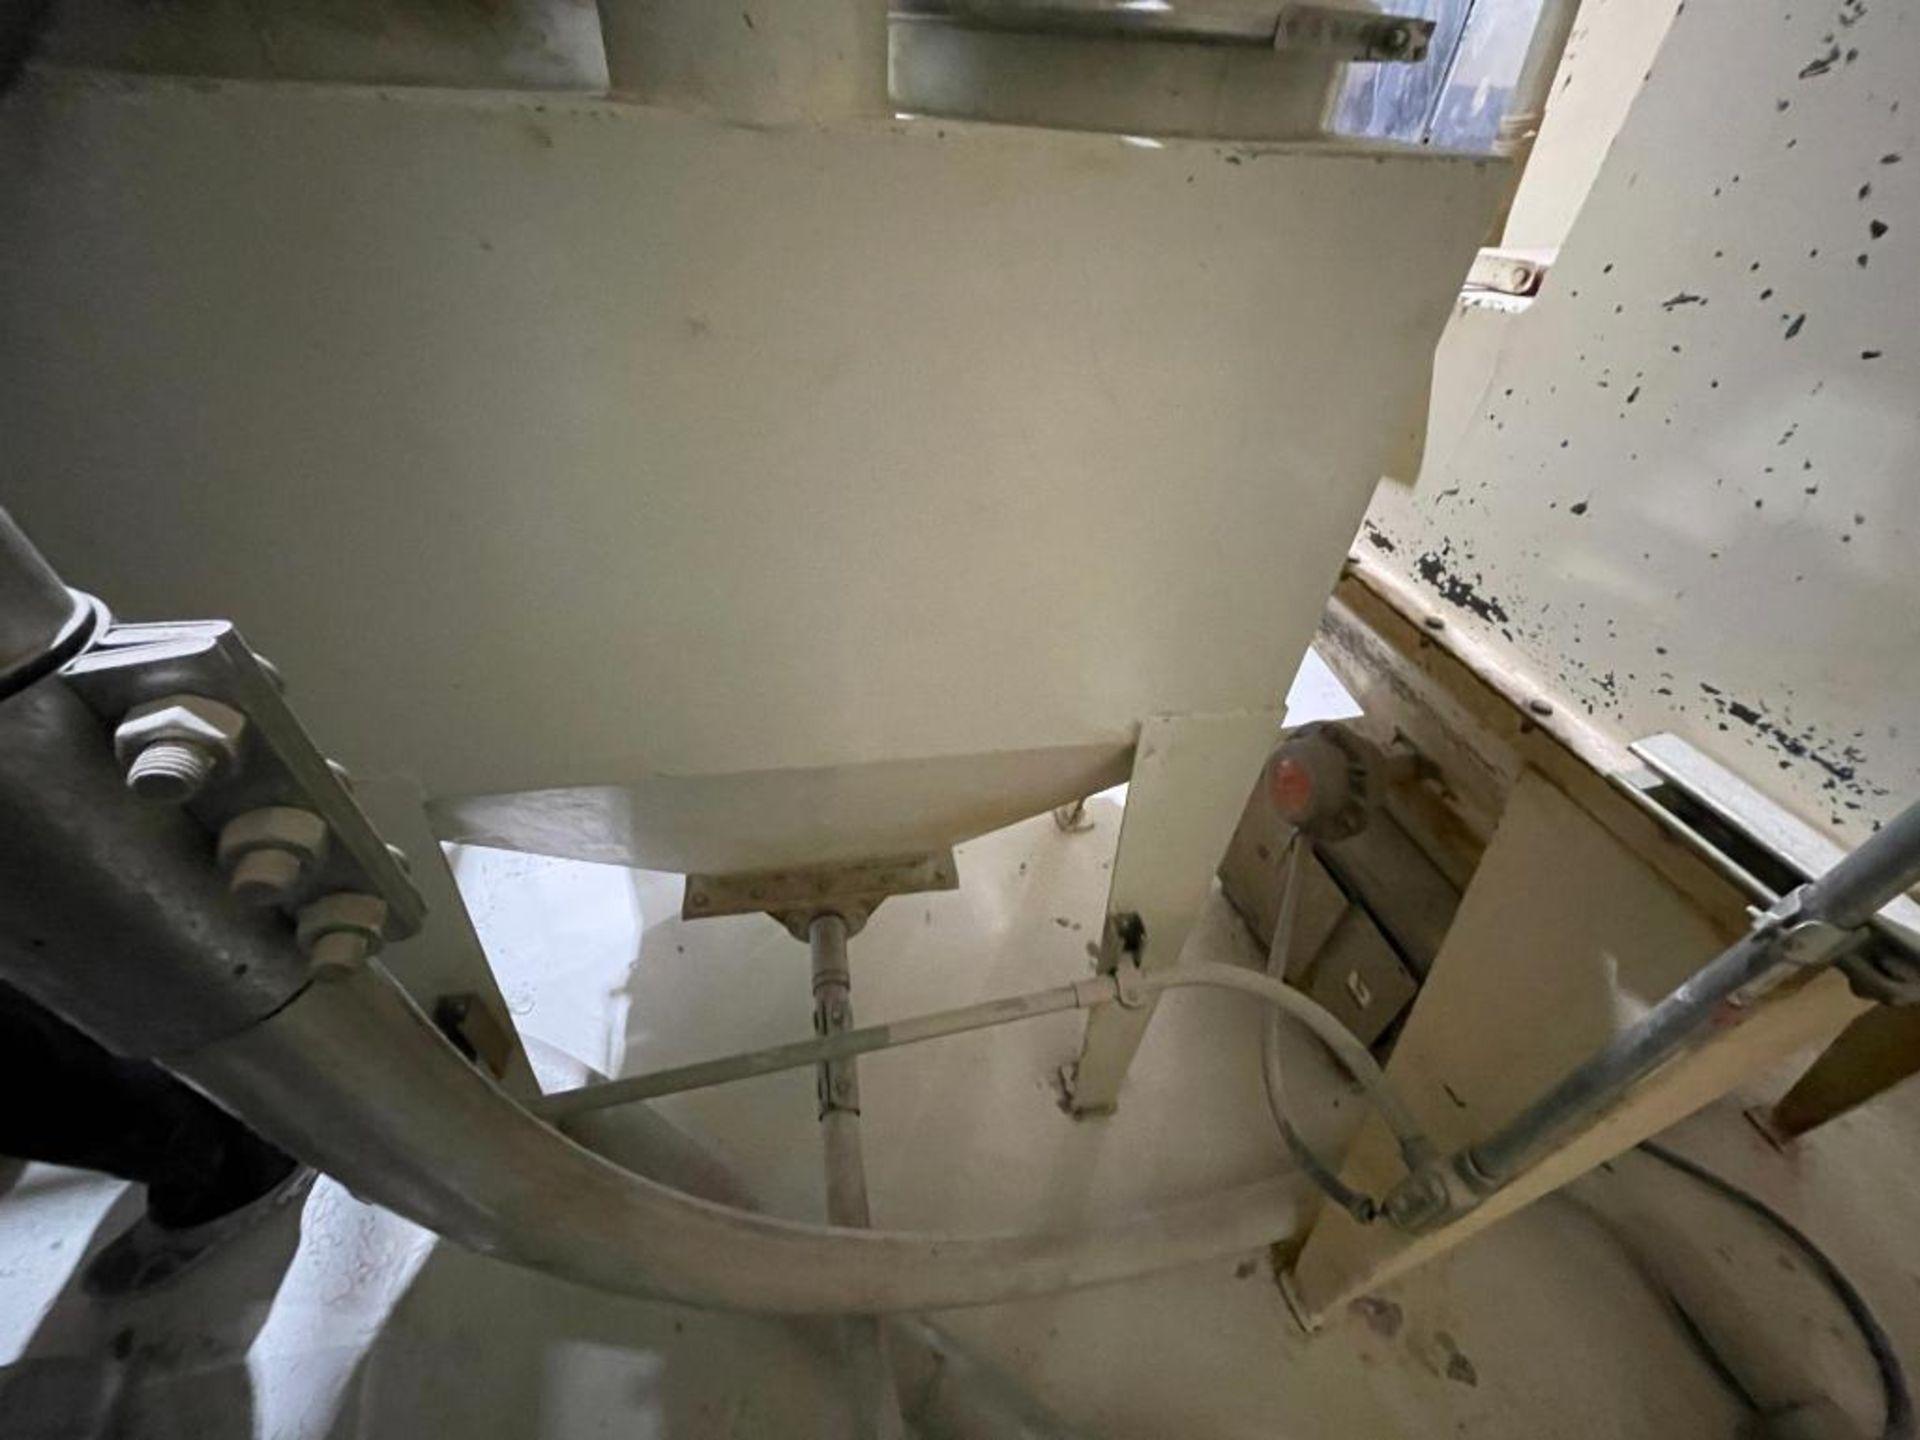 K-Tron dry ingredients dump station - Image 16 of 18